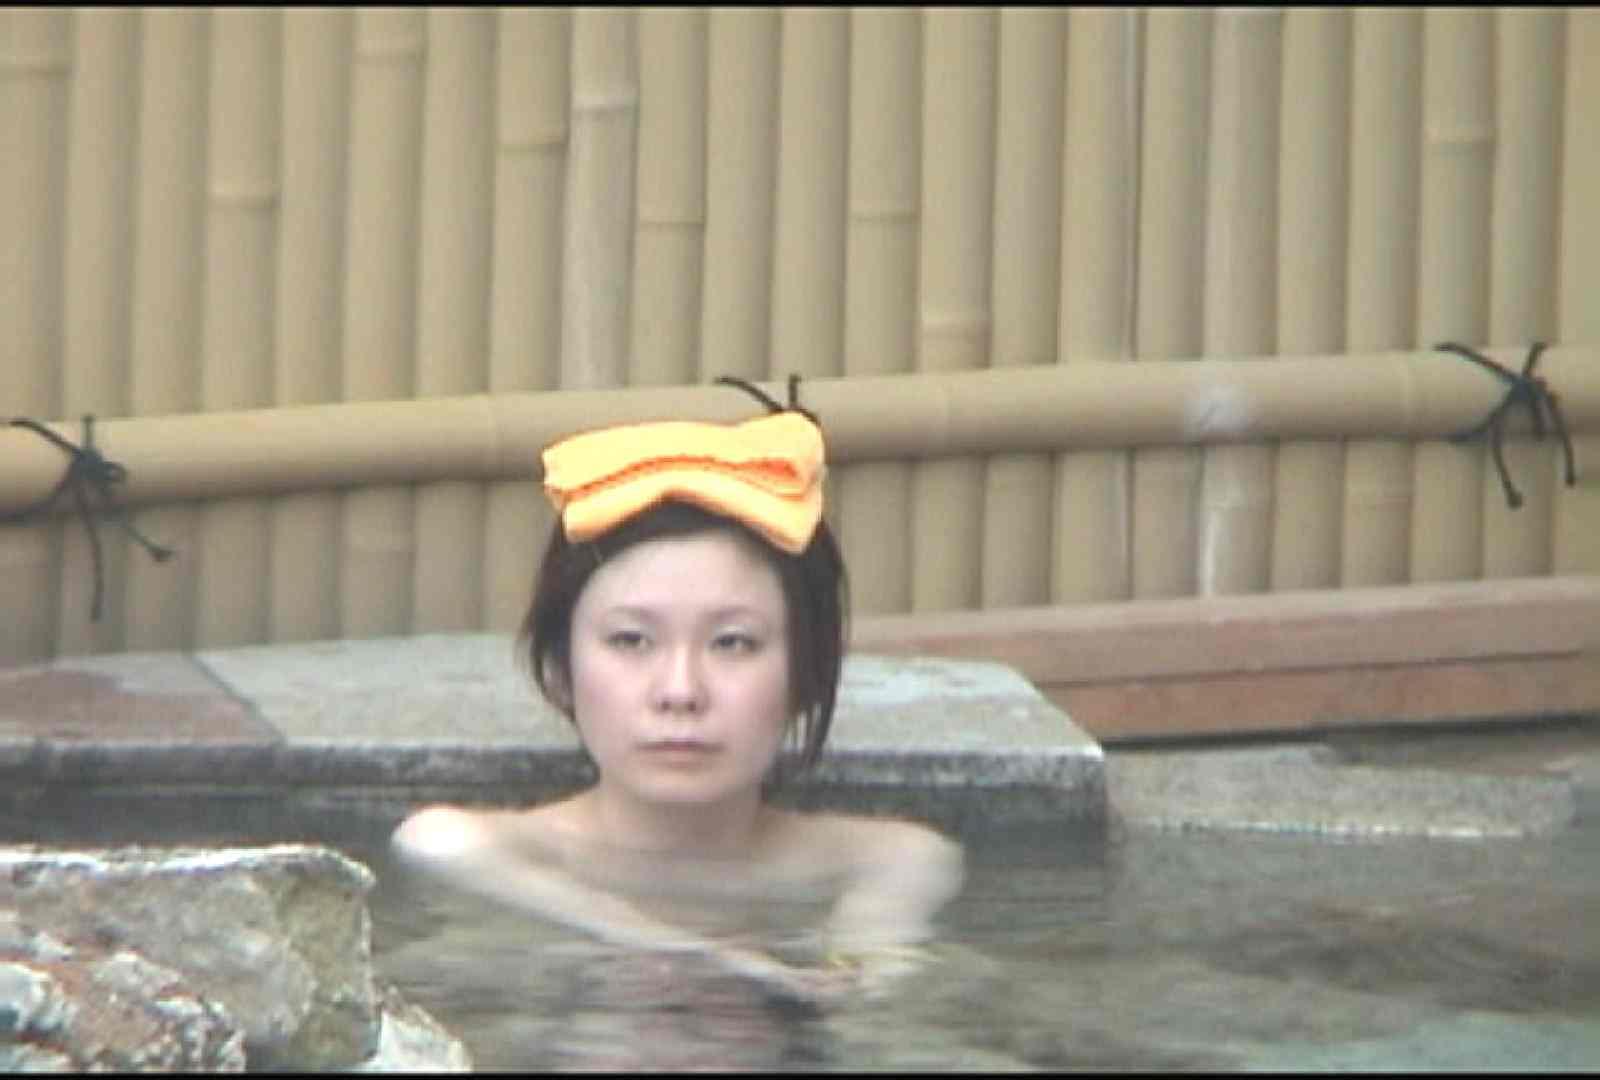 Aquaな露天風呂Vol.177 綺麗なOLたち アダルト動画キャプチャ 112枚 32